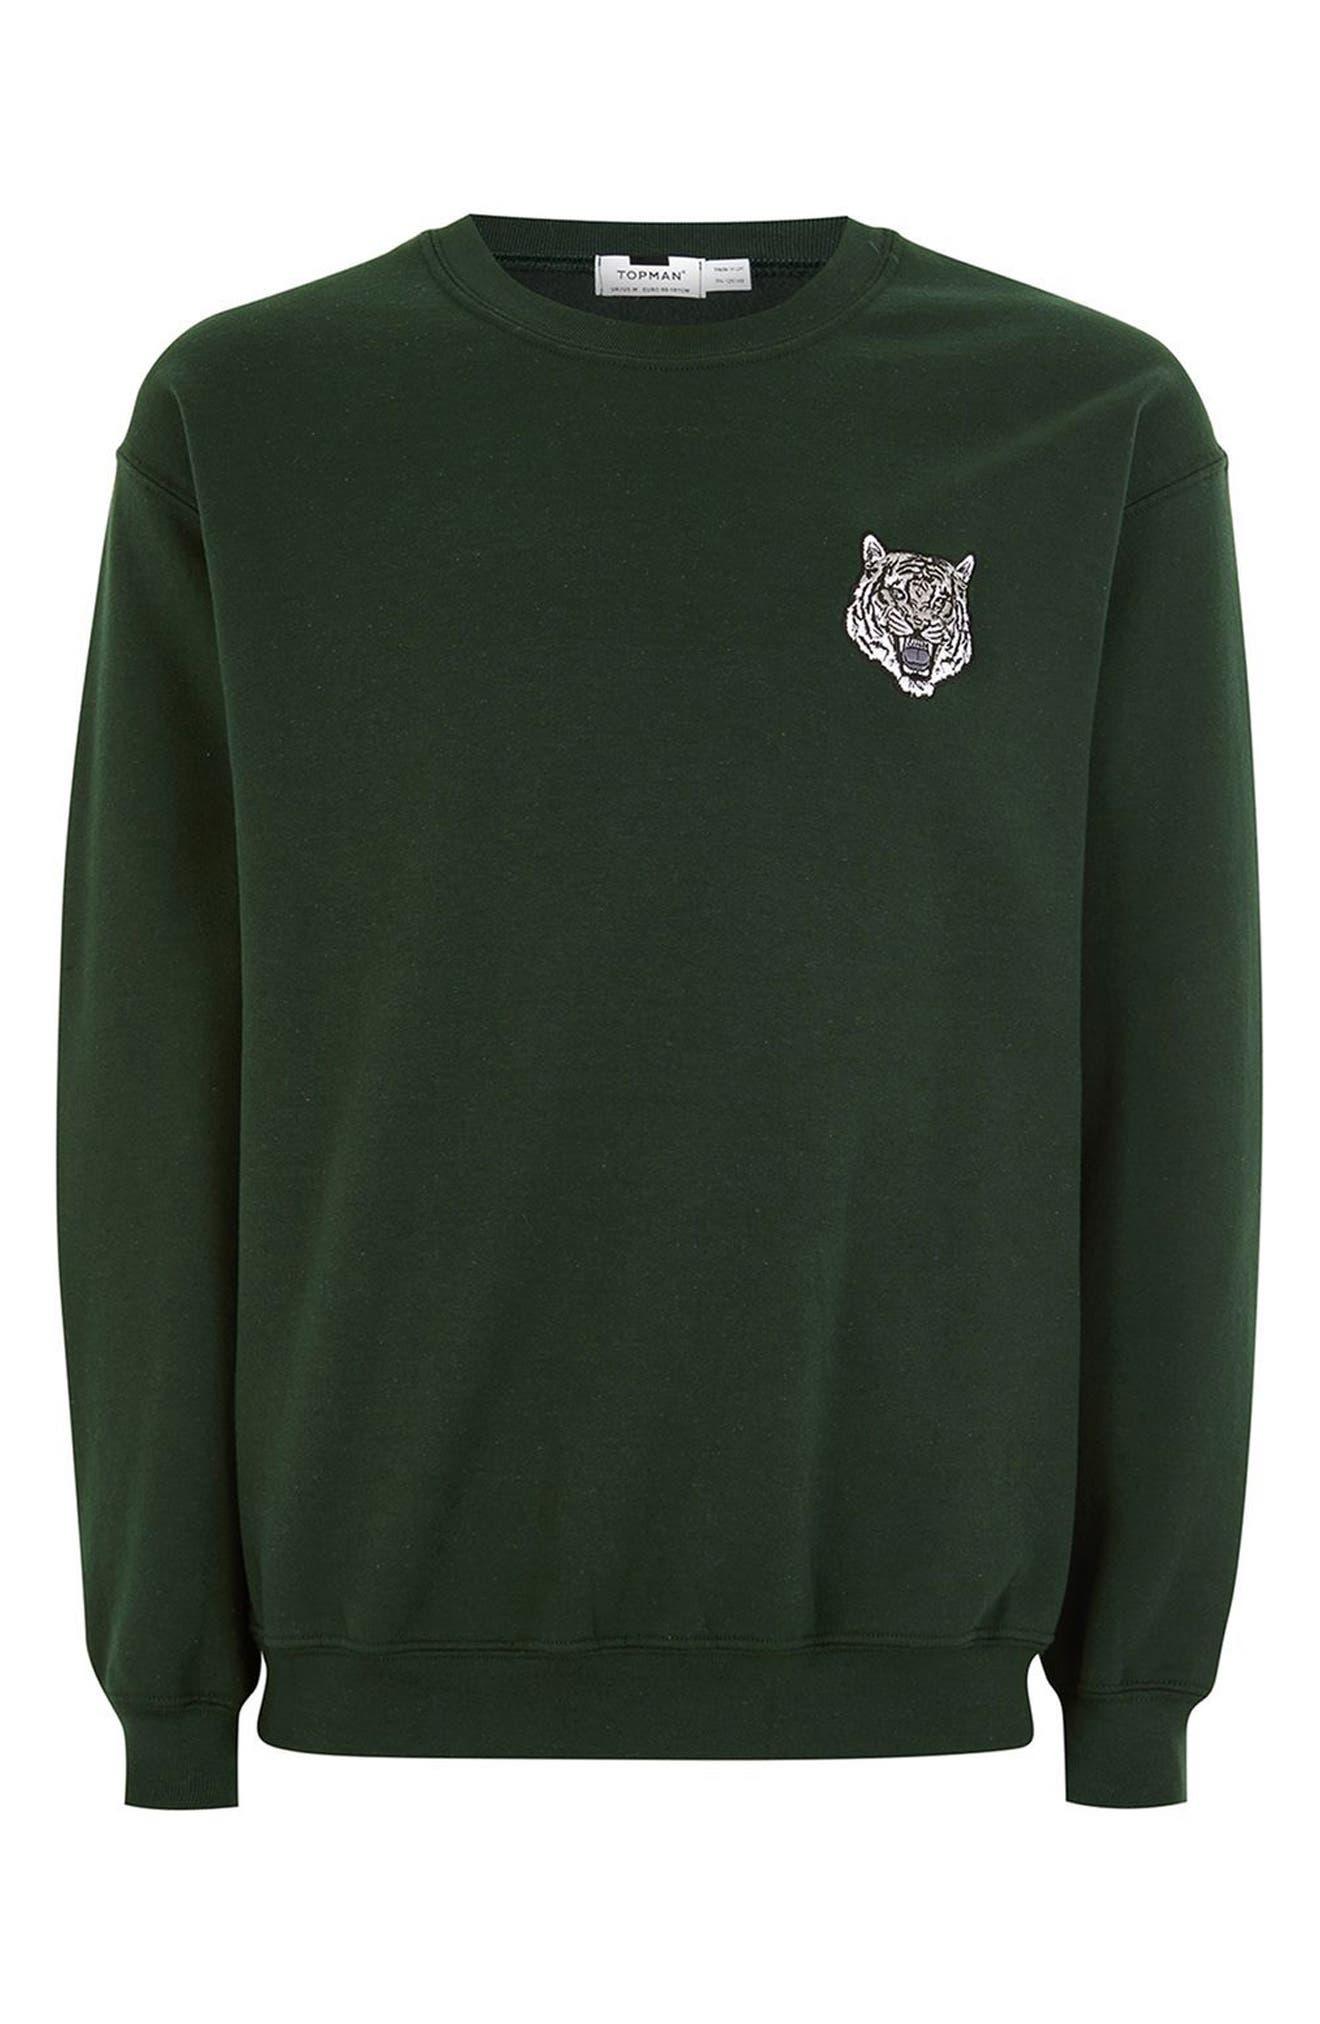 Tiger Patch Sweatshirt,                             Alternate thumbnail 4, color,                             Olive